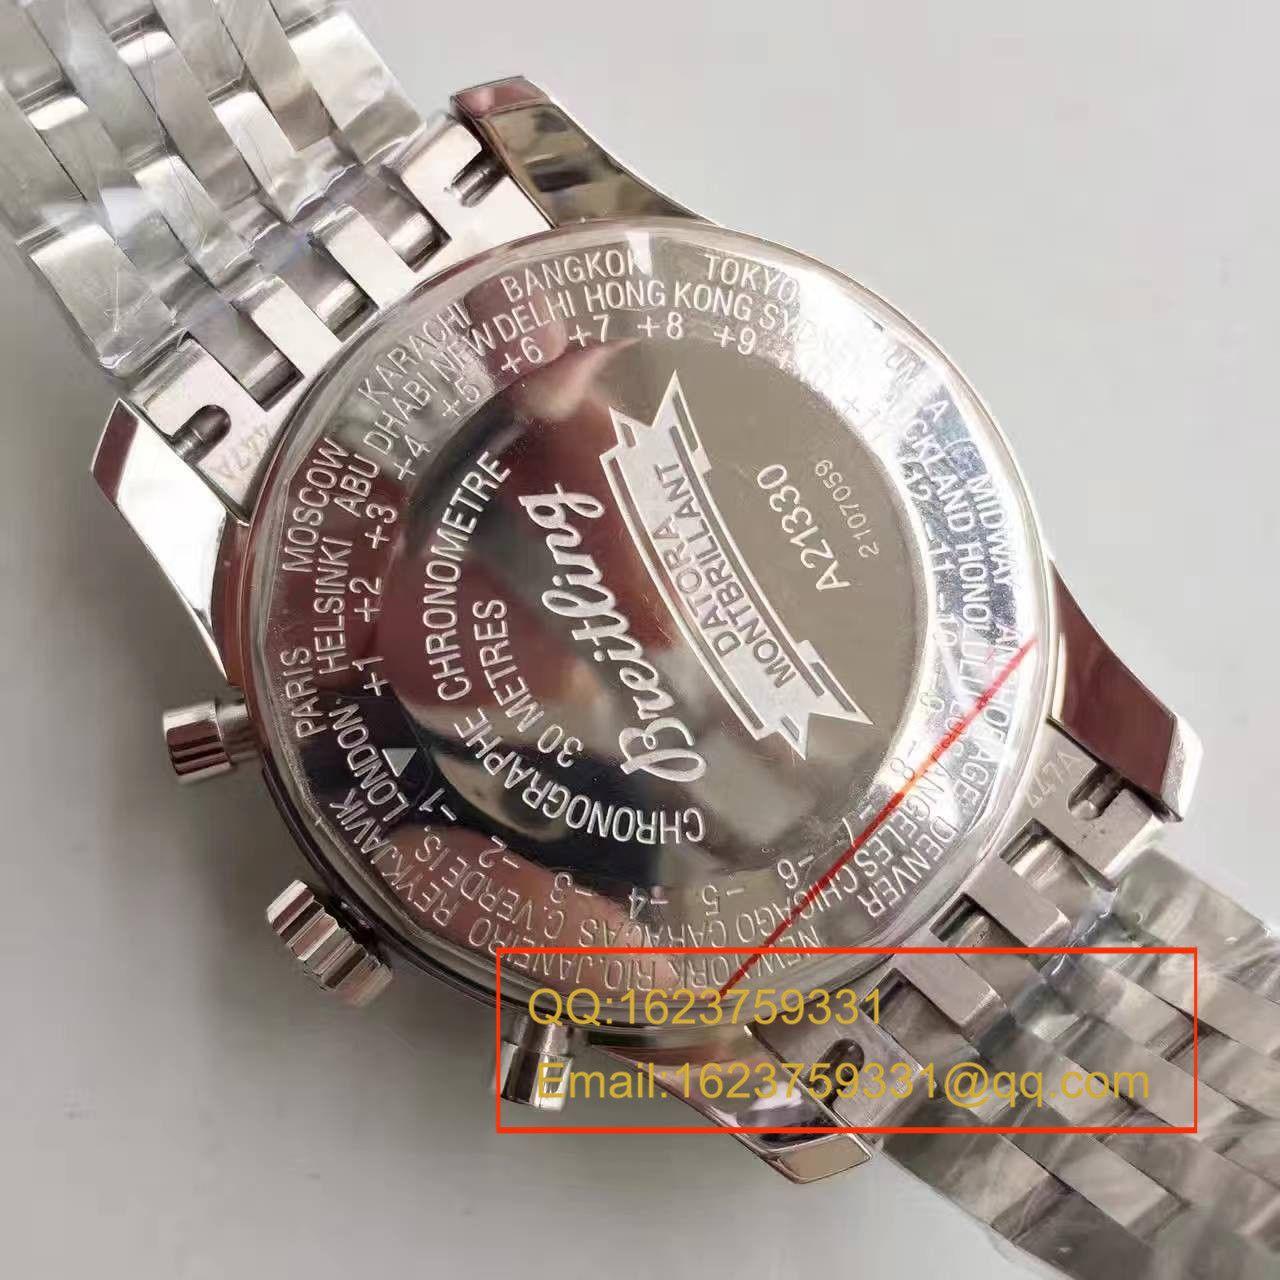 【JF一比一顶级复刻手表】百年灵蒙柏朗计时系列A2133012-B571黑盘腕表 / BL041.1